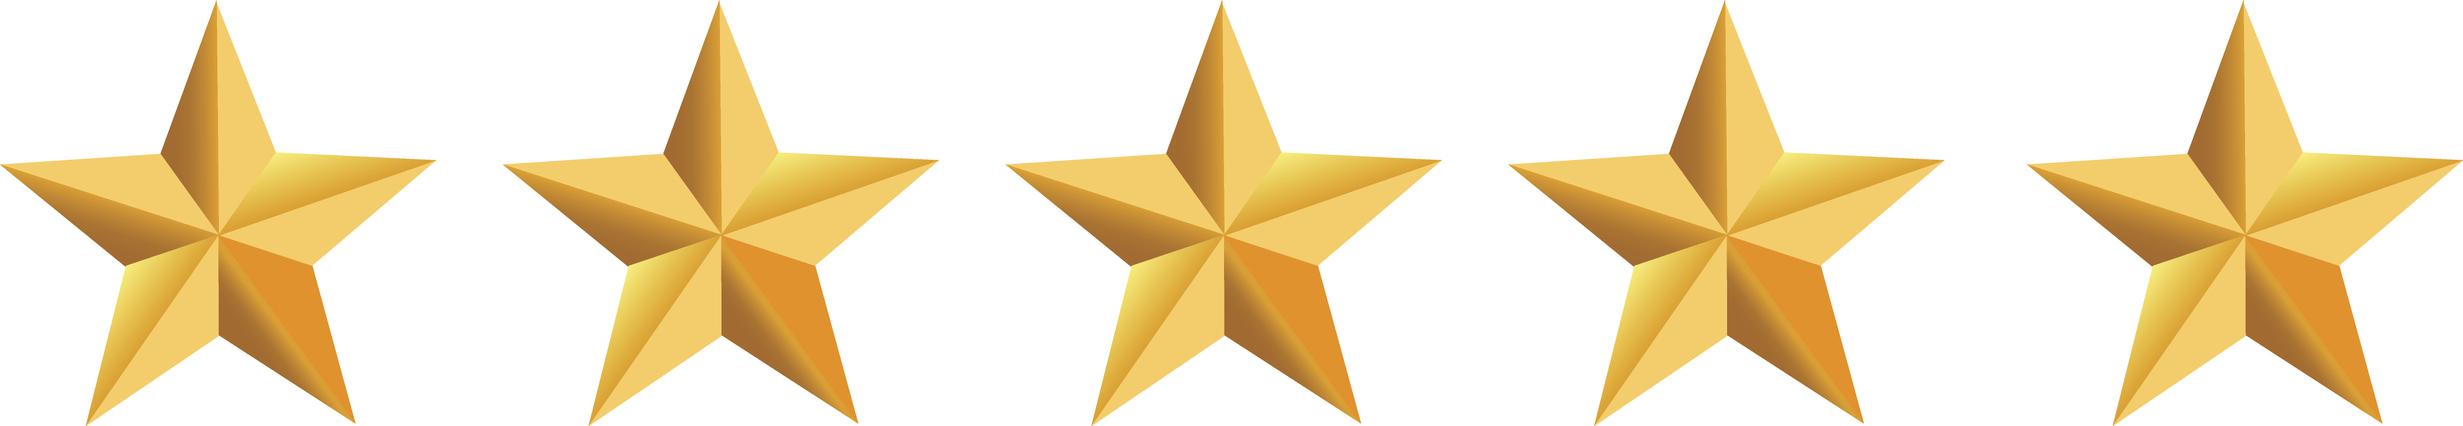 iStock-5 Stars 586055144.jpg